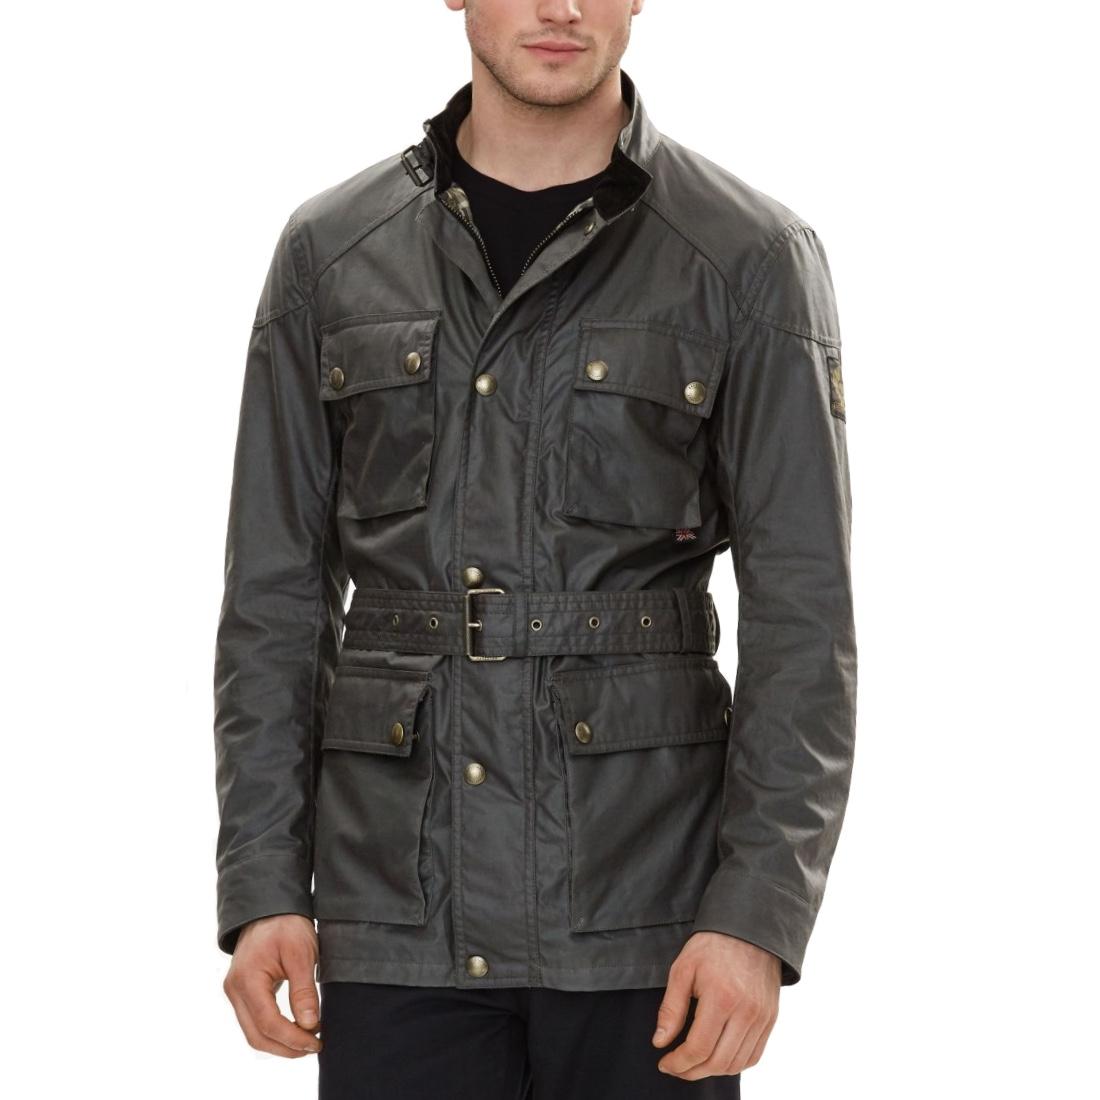 Belstaff The Roadmaster Jacket In Windward Grey Signature 6Oz Waxed Cotton Men 1.jpg